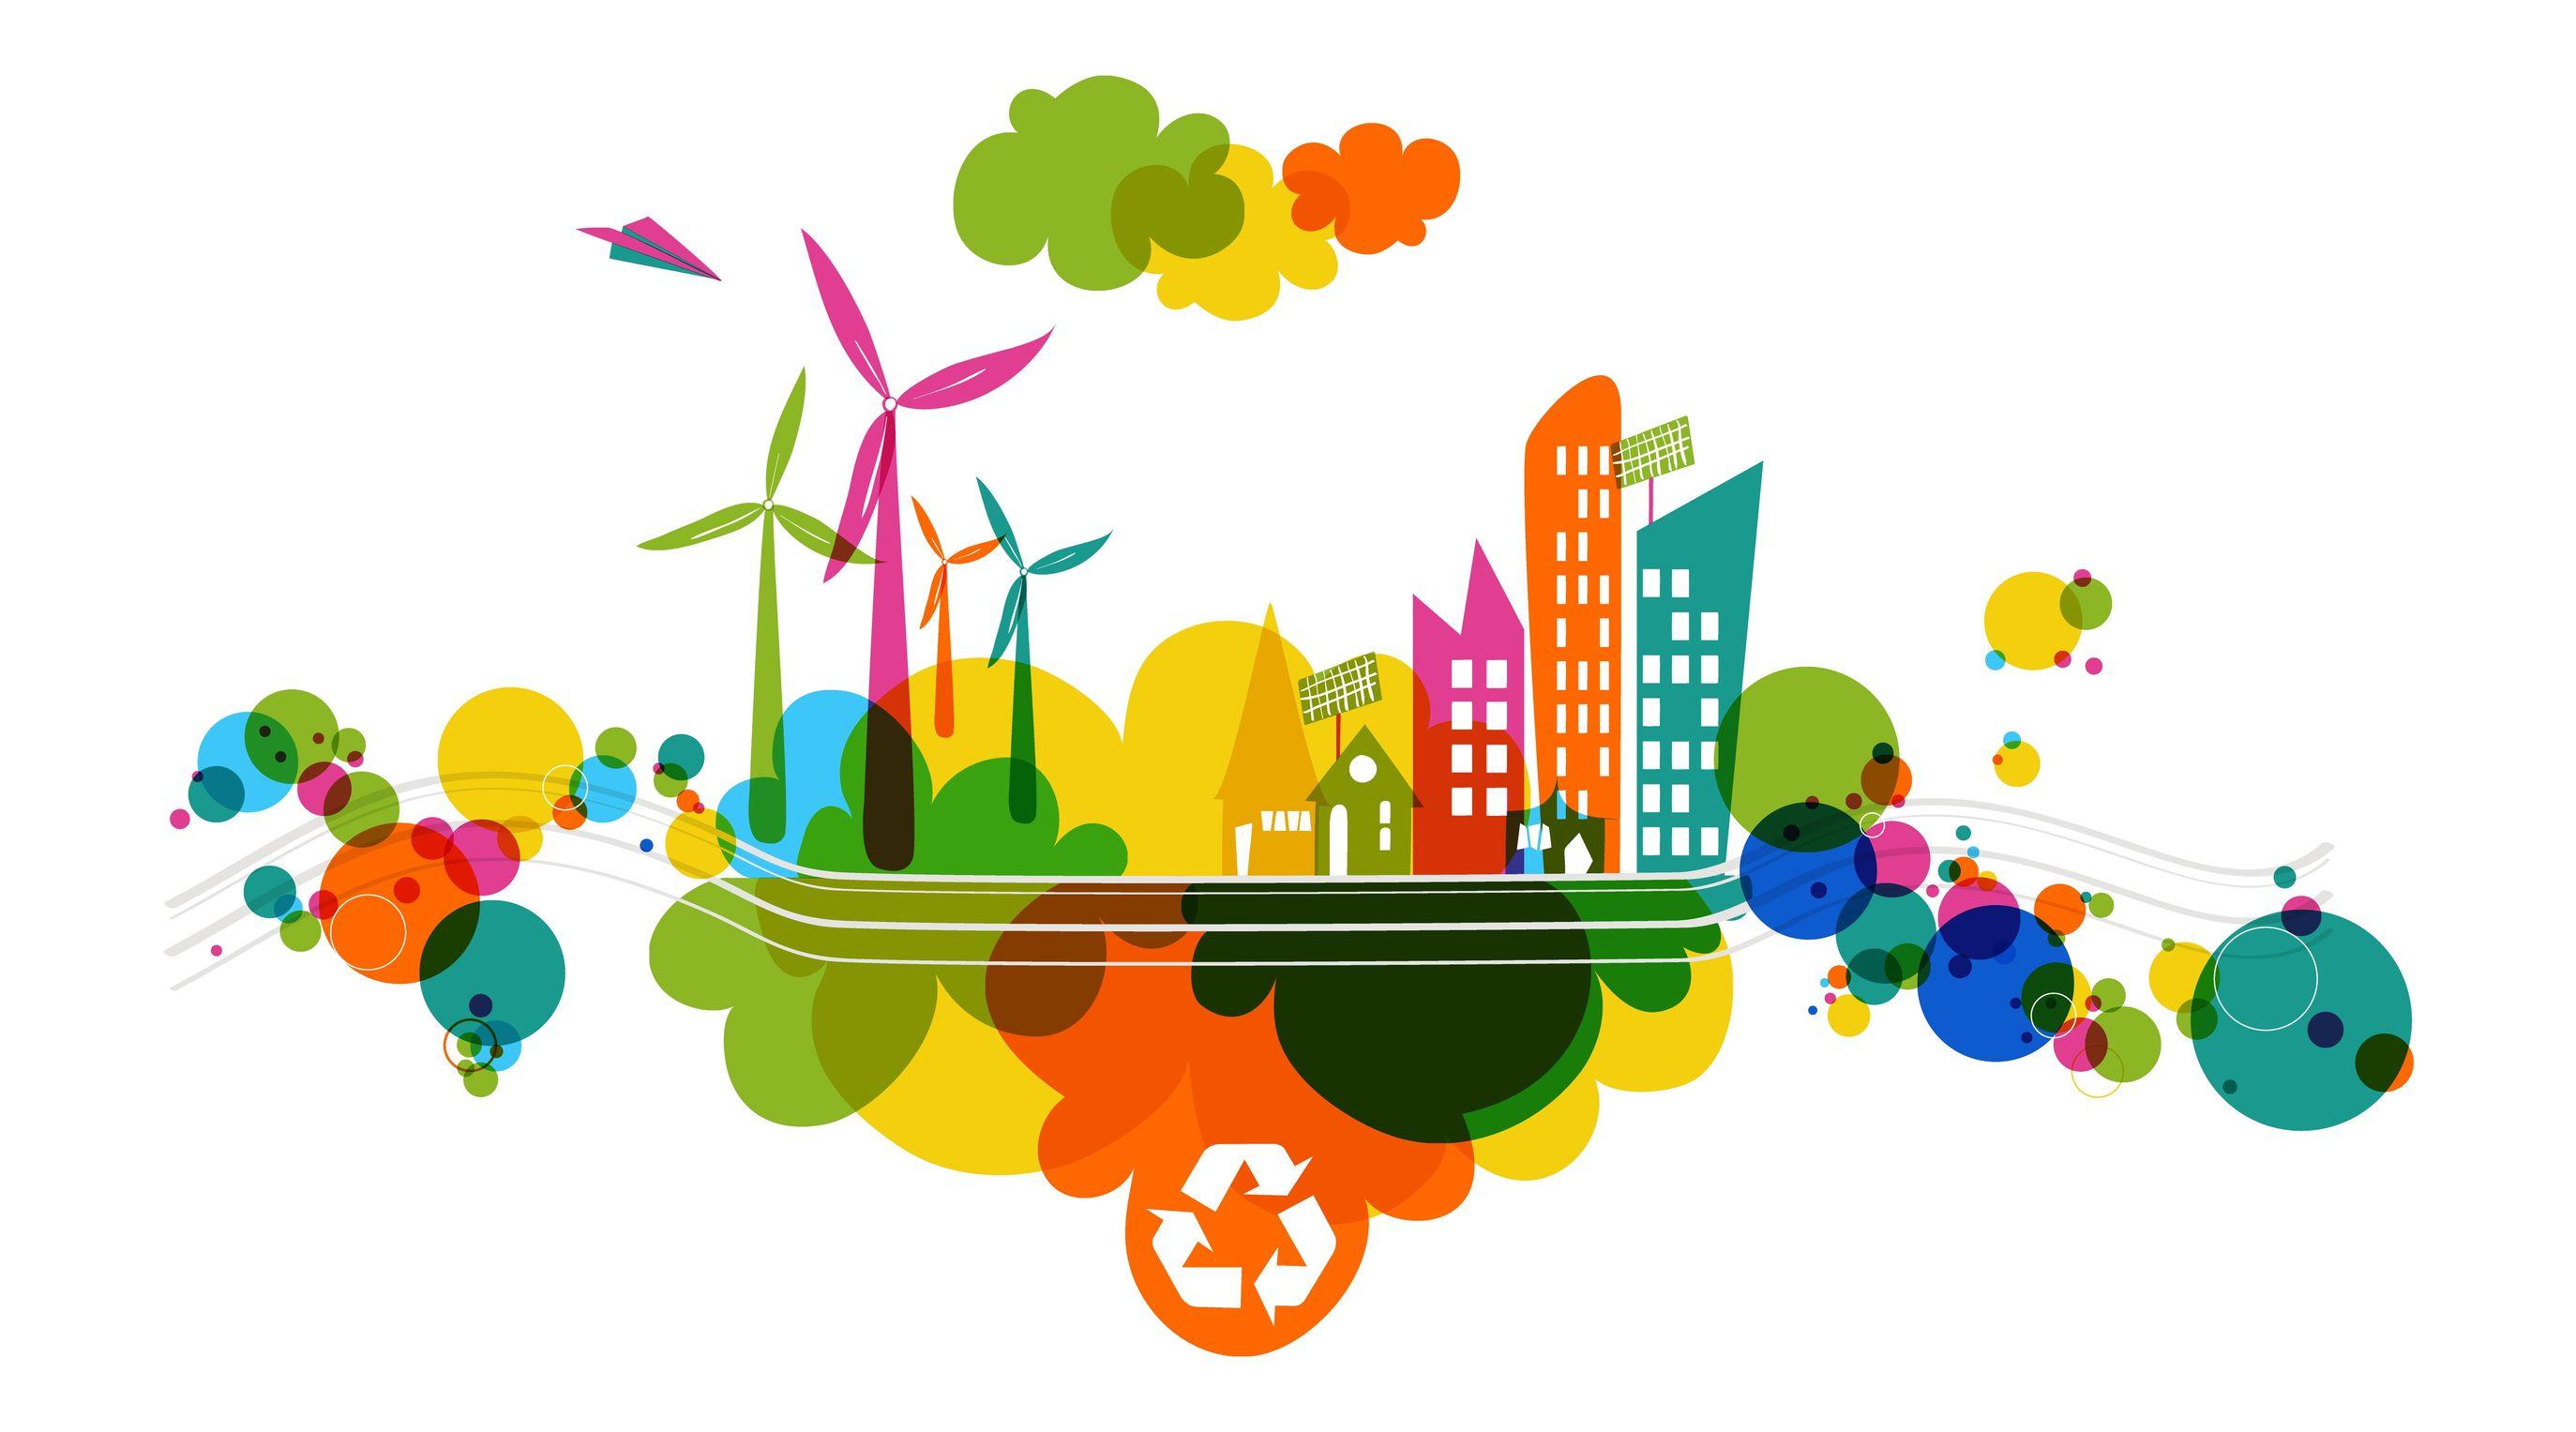 Toxic clipart proper waste management Household  for Tips Hazardous